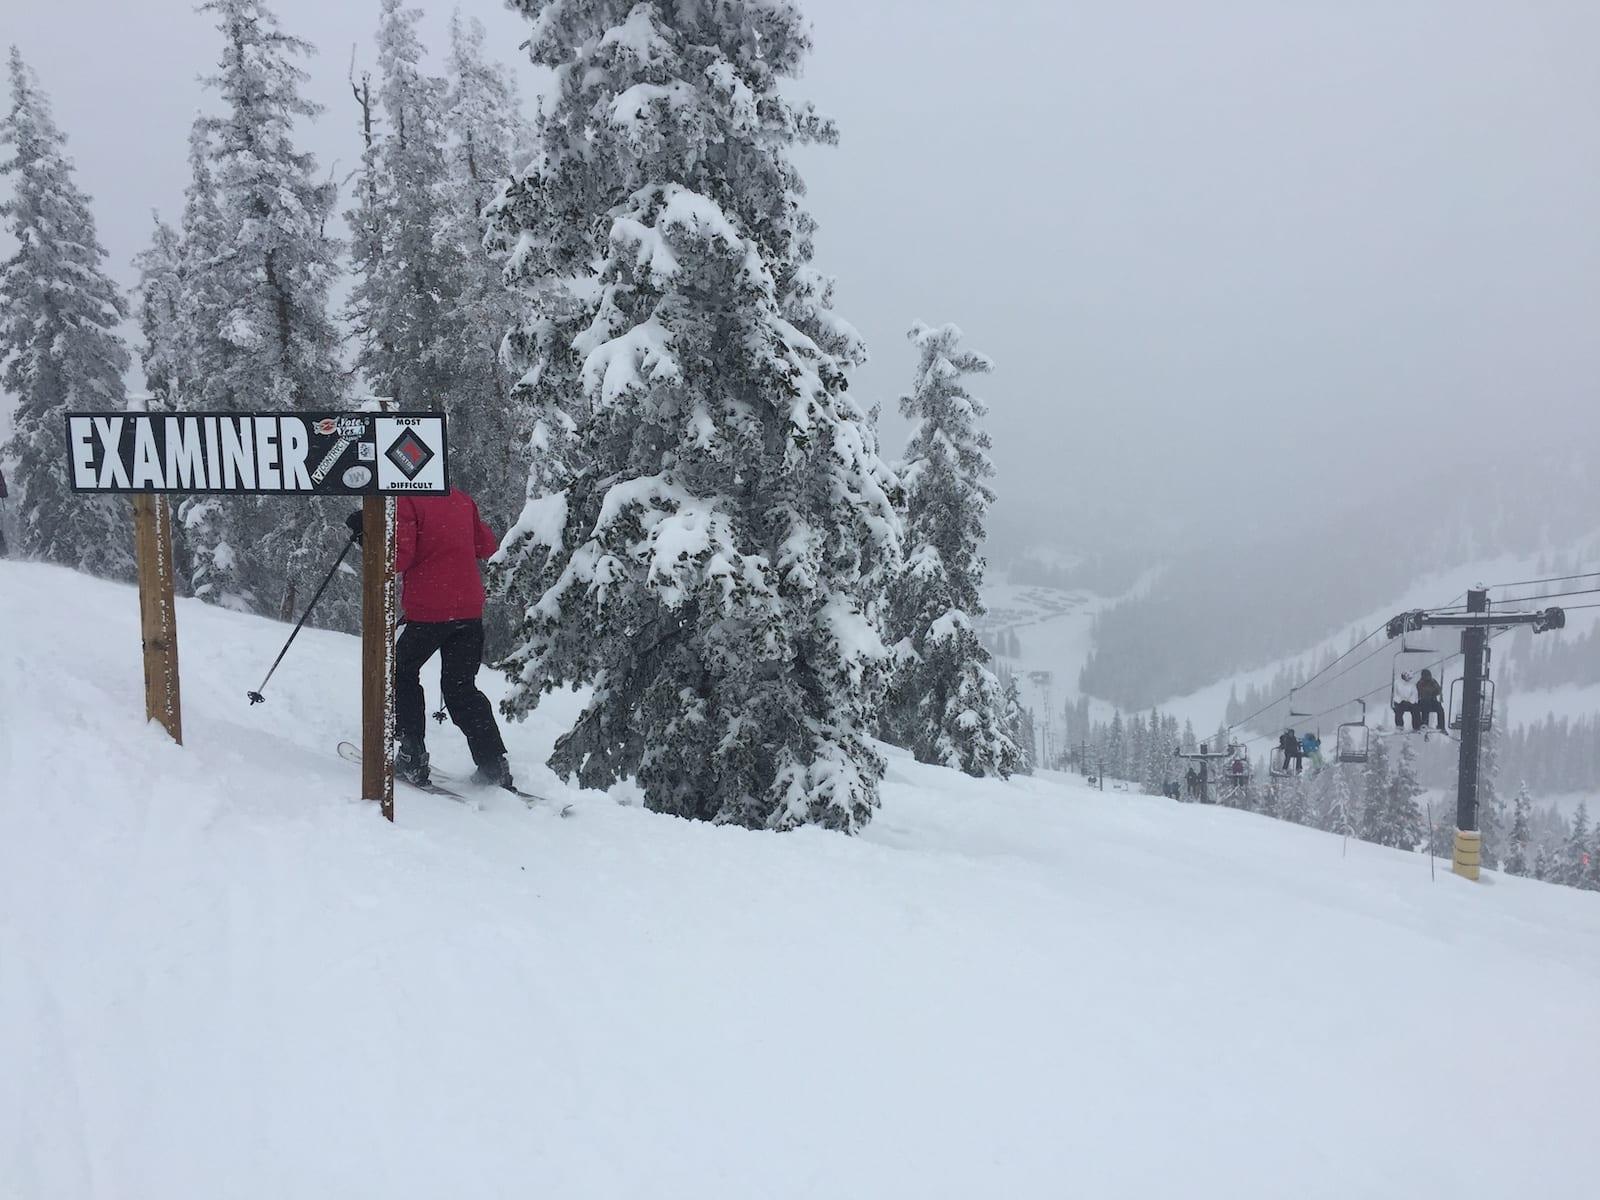 Monarch Mountain Ski Resort Examiner Trail